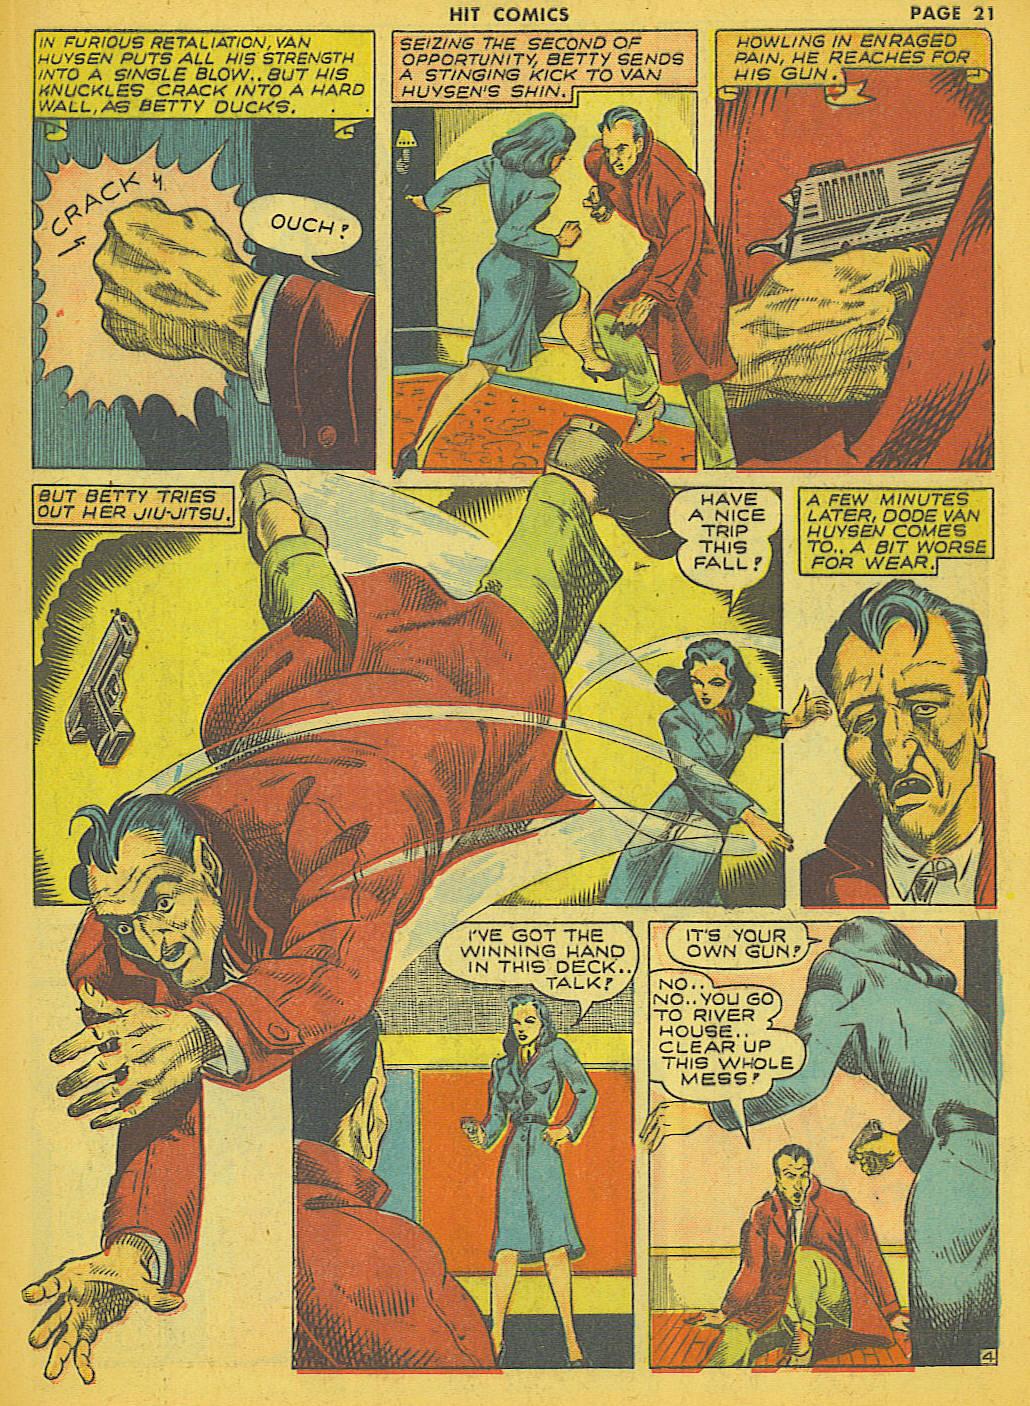 Read online Hit Comics comic -  Issue #21 - 23